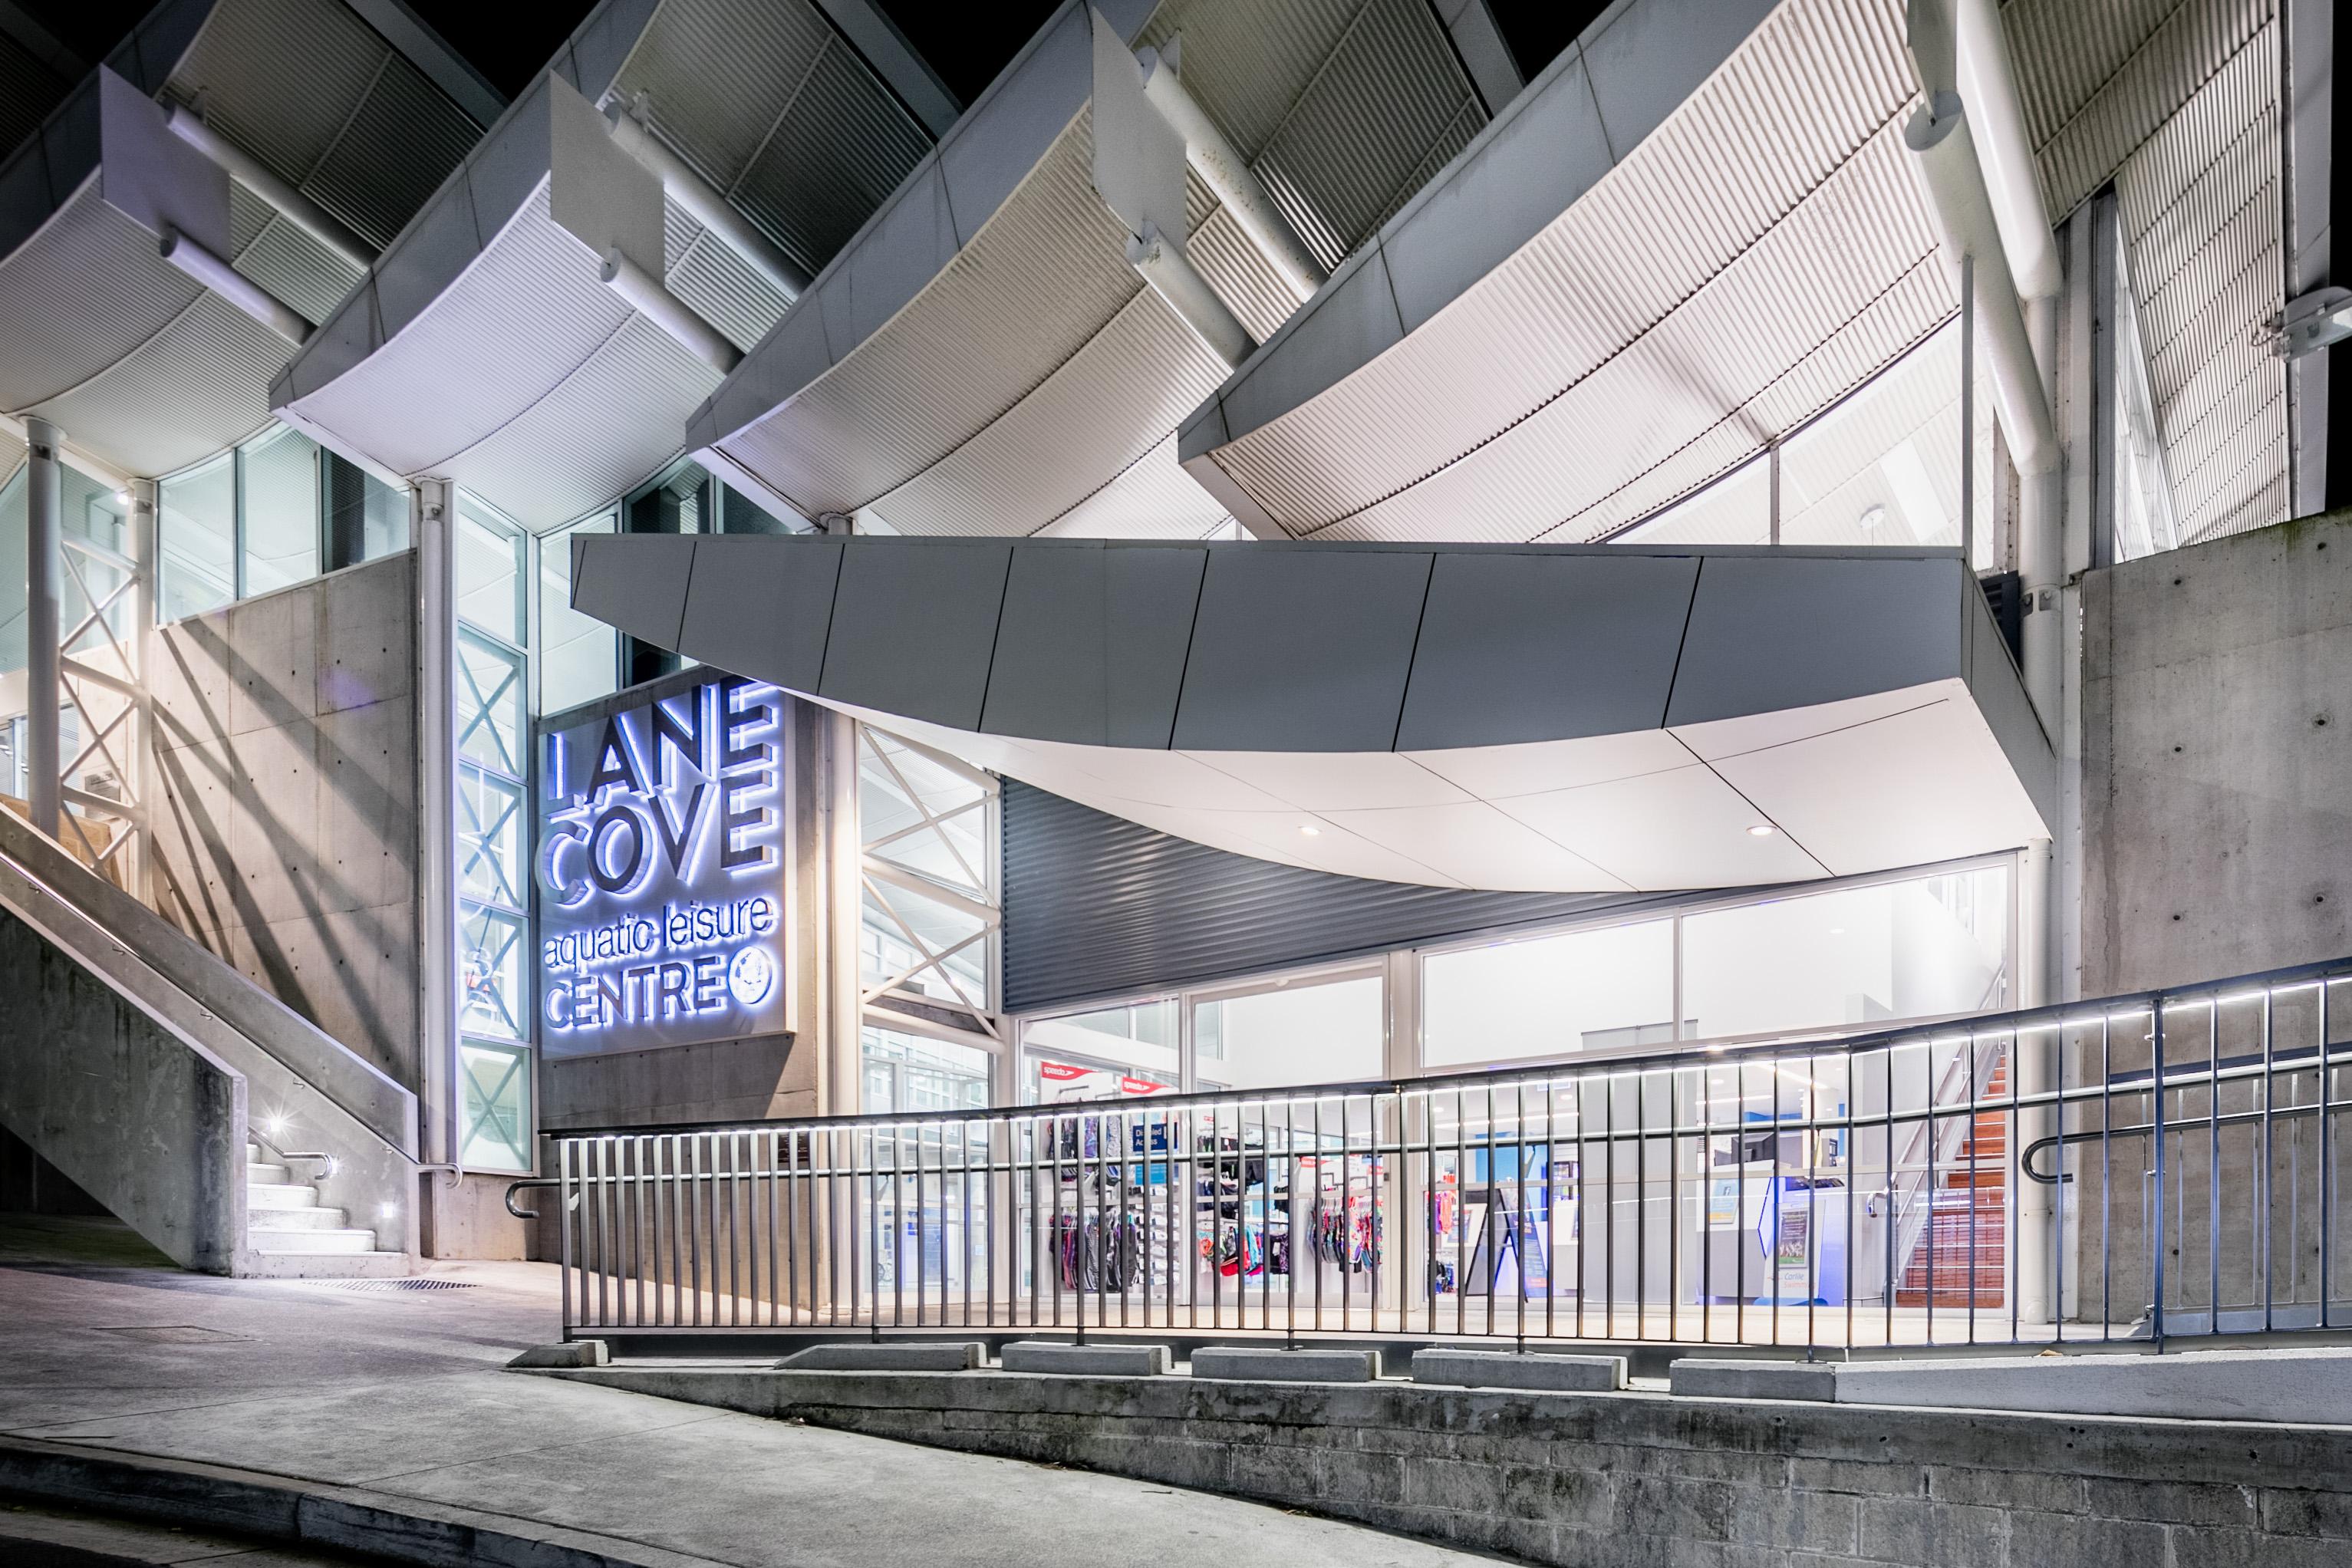 Gez-Xavier-Mansfield-Photography-Avant-Constructions-LaneCove-Aquatic-Project-October2017-37